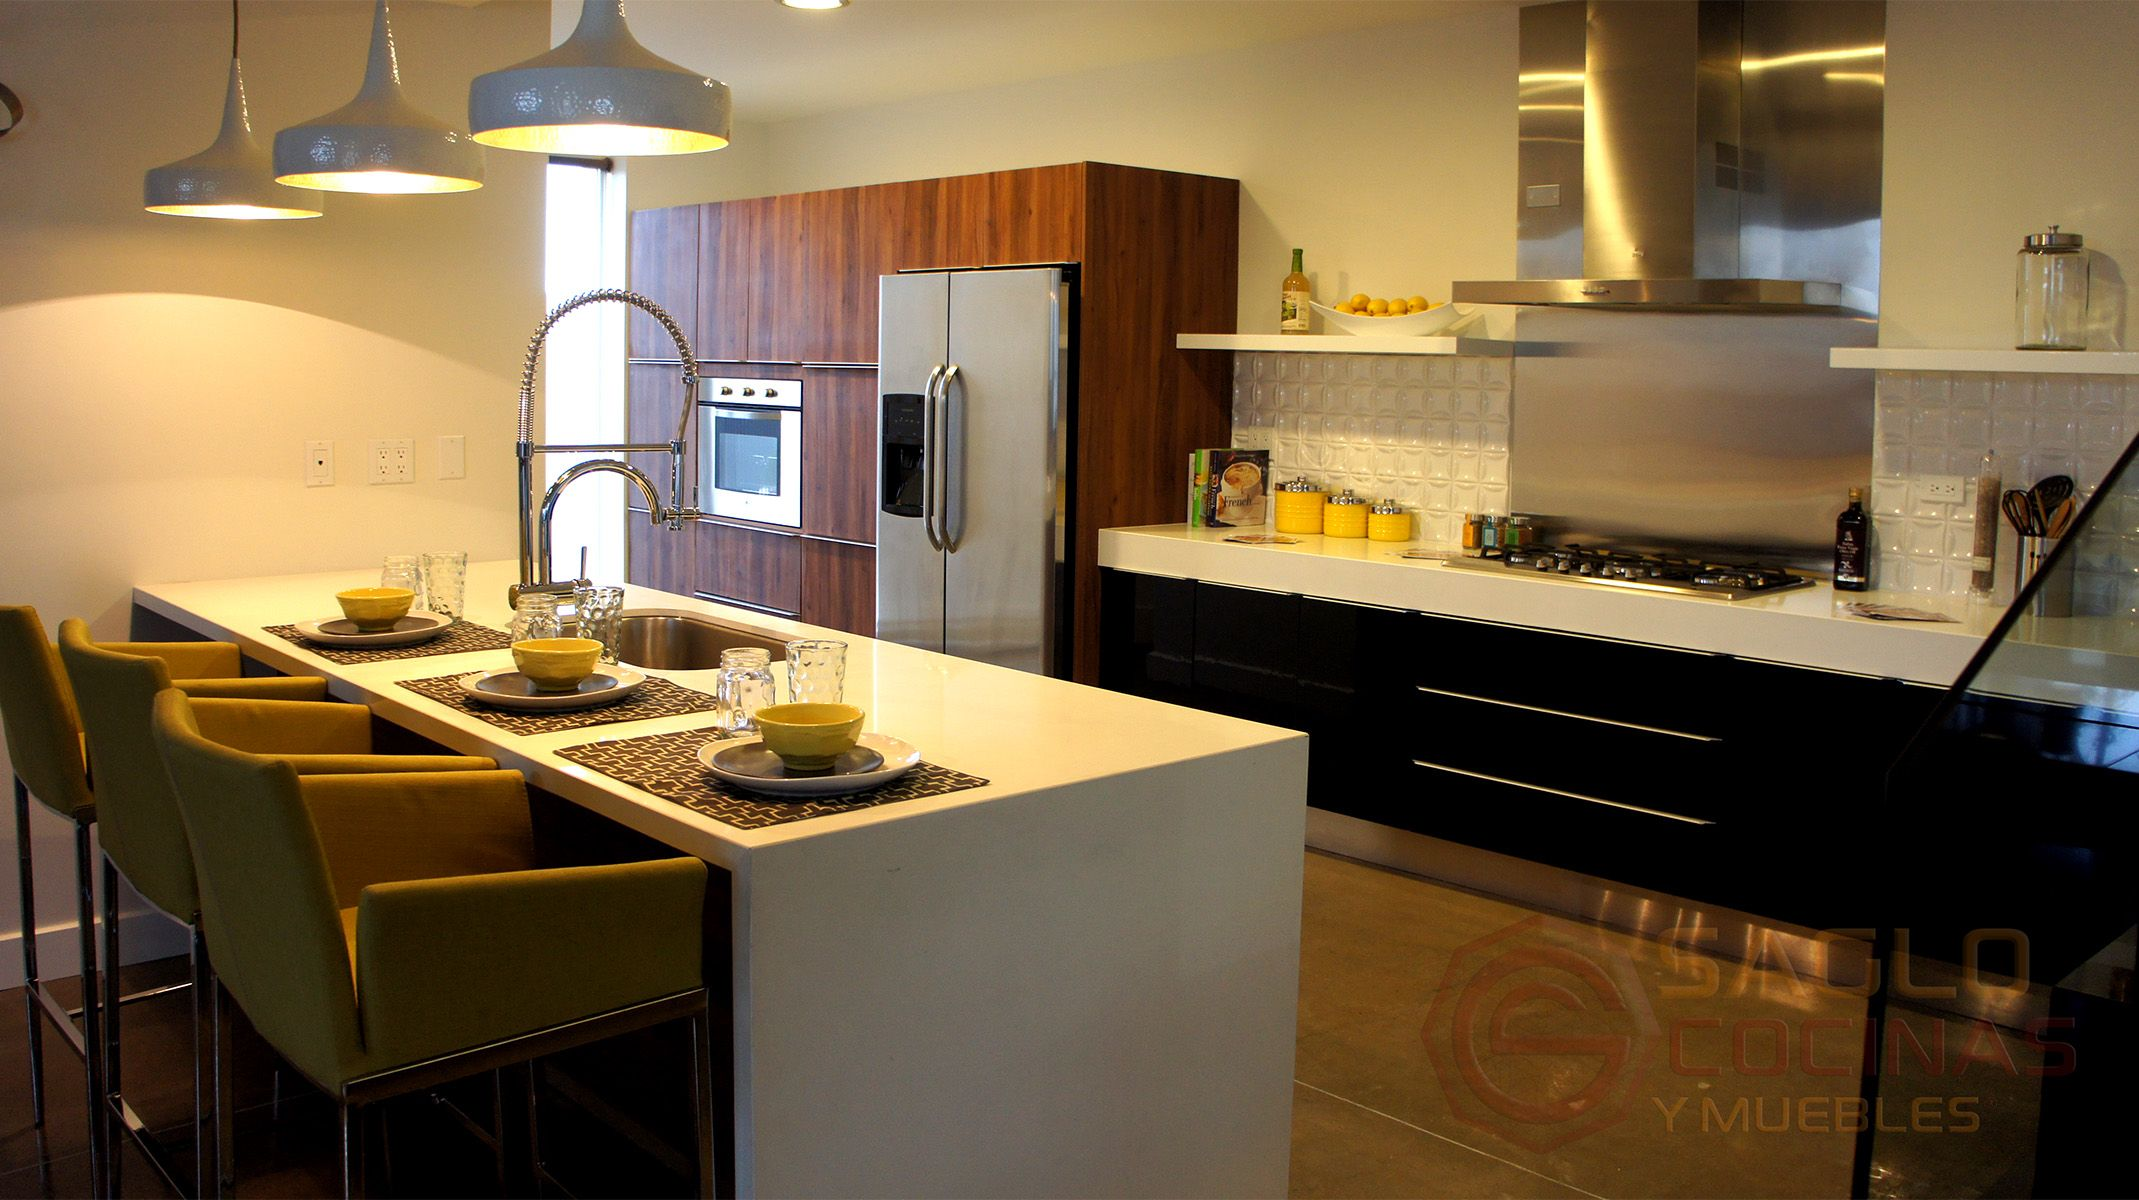 Cocina Integral Moderna En Color Chocolate Con Un Contraste En